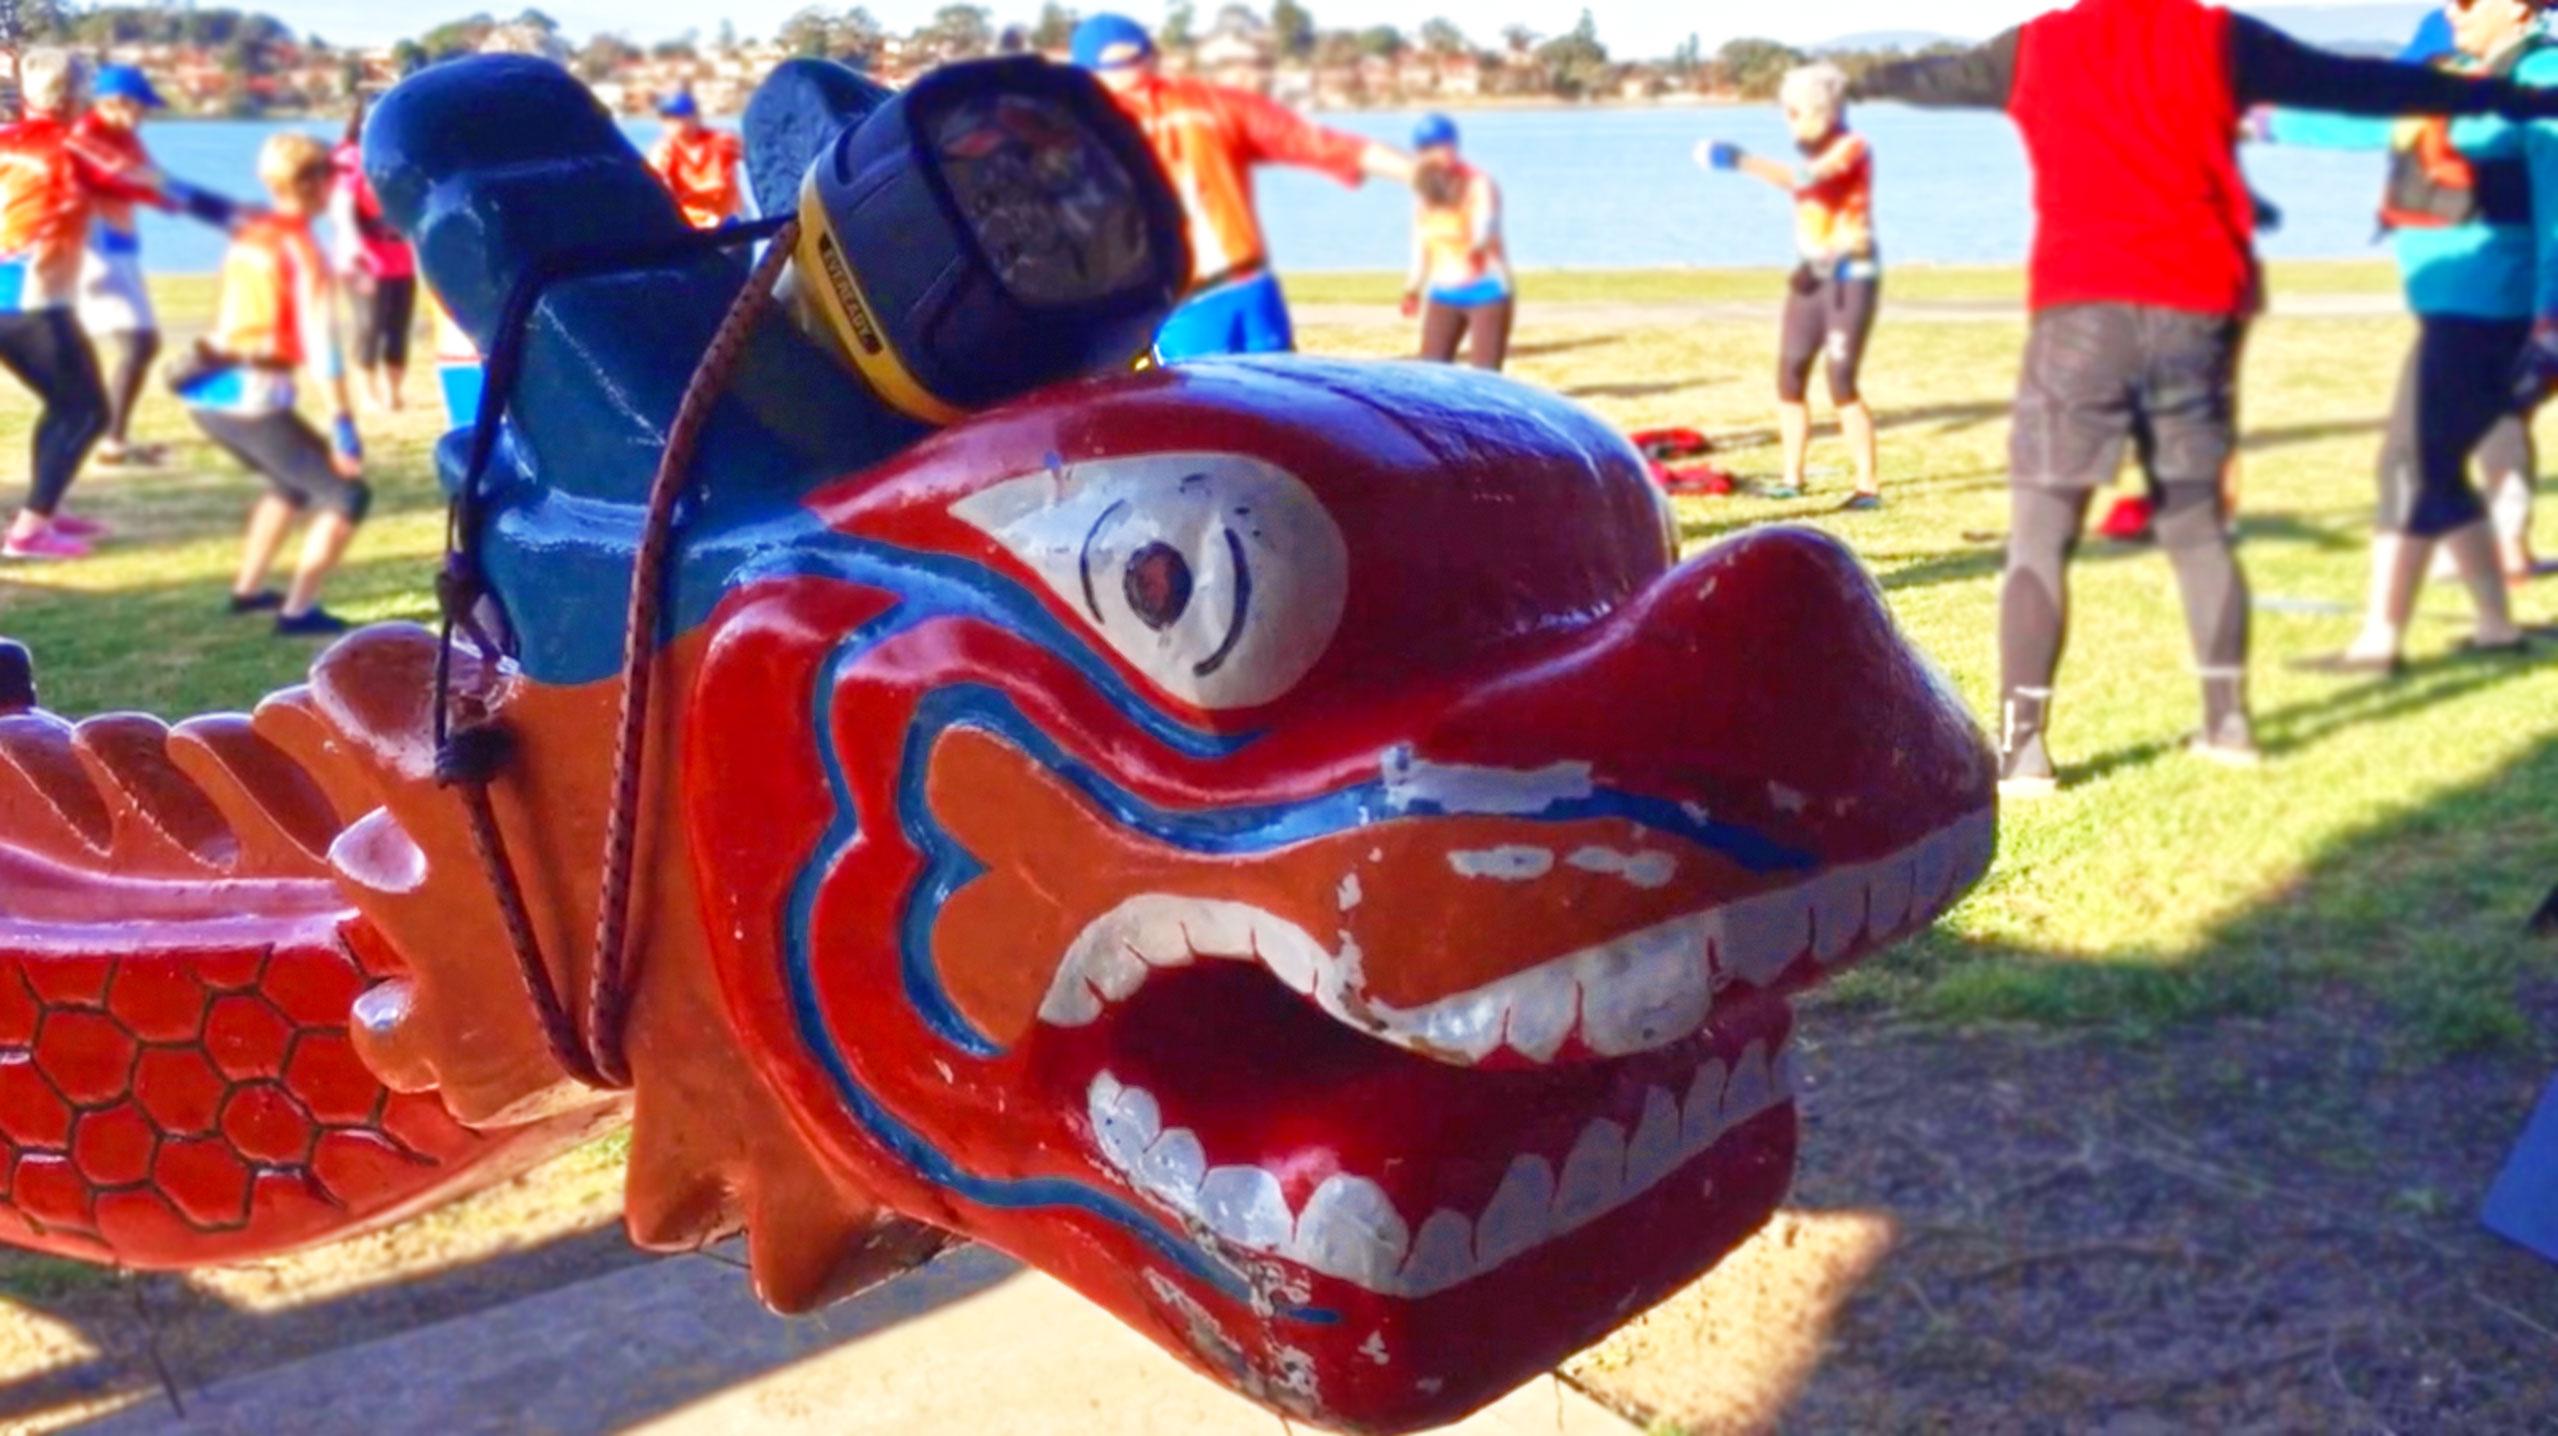 Illawarra Dragon Boat Club membership numbers fire up